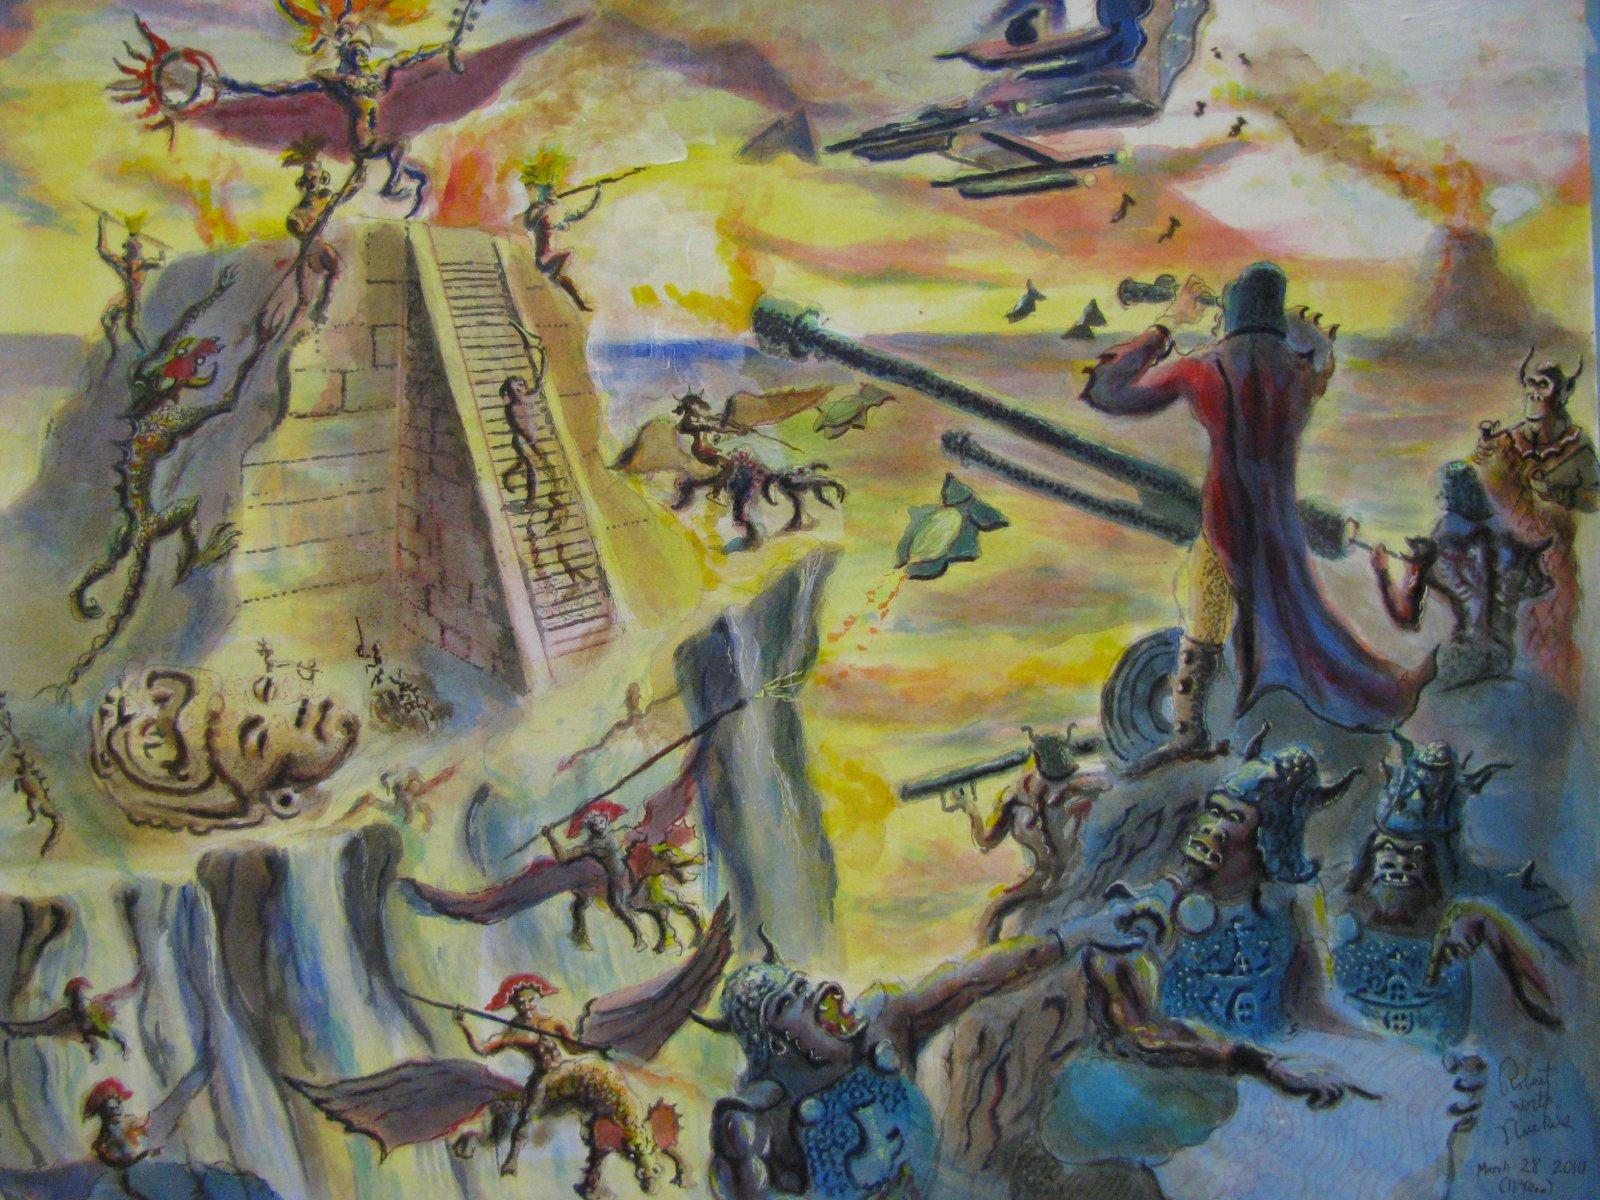 Trippy Wallpaper Iphone X Http Robertworth Elfwood Com Demon Battle In Mayan